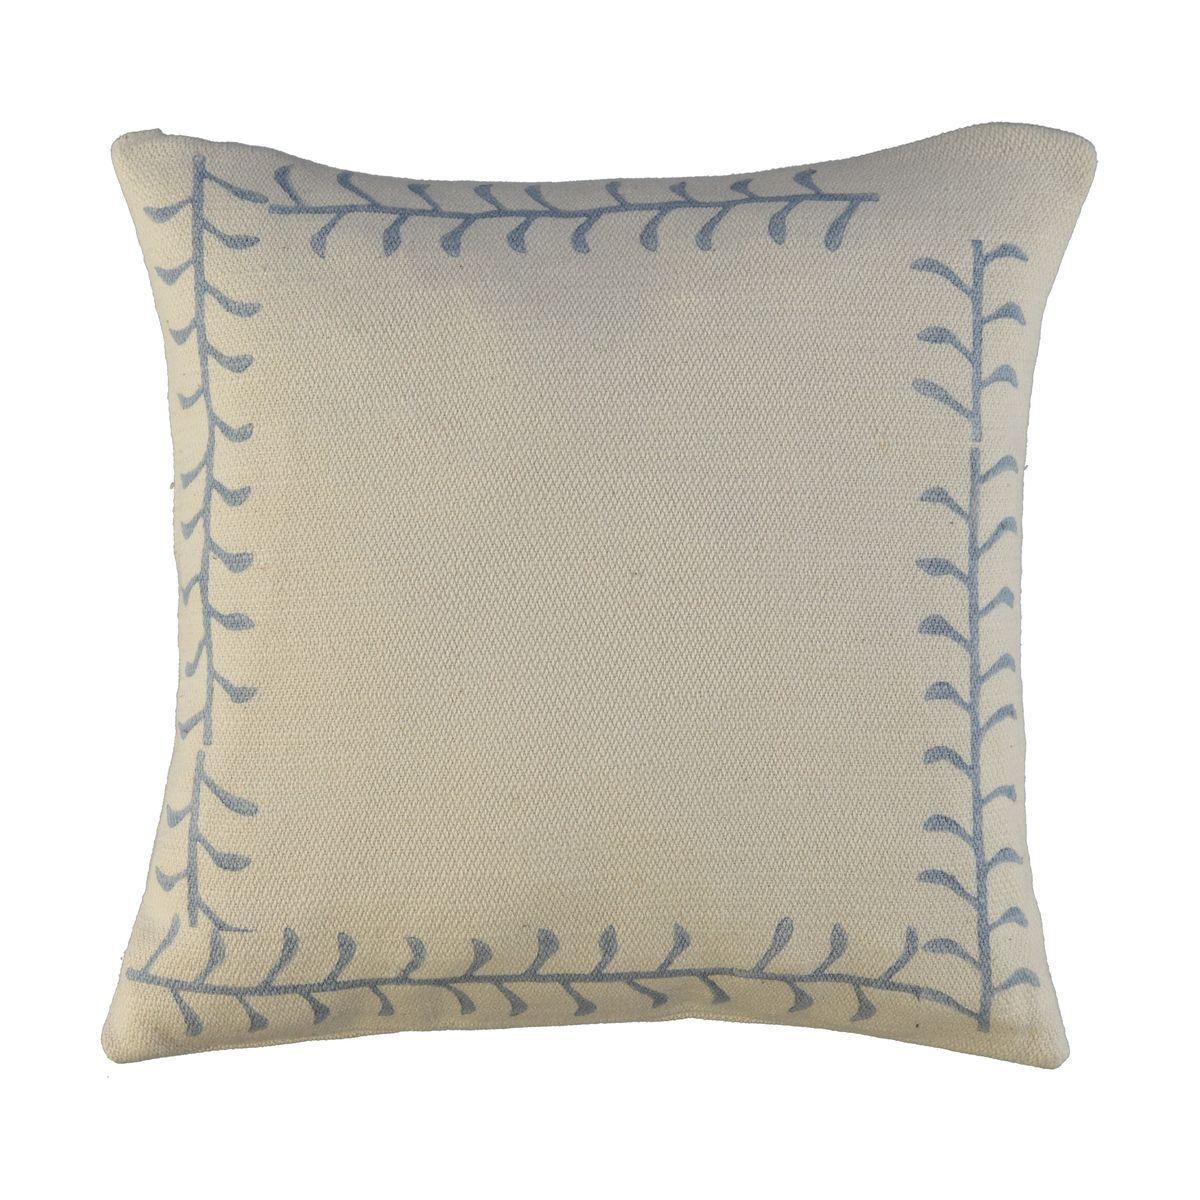 Cushion Cover / 16 Hand Printed - Blue